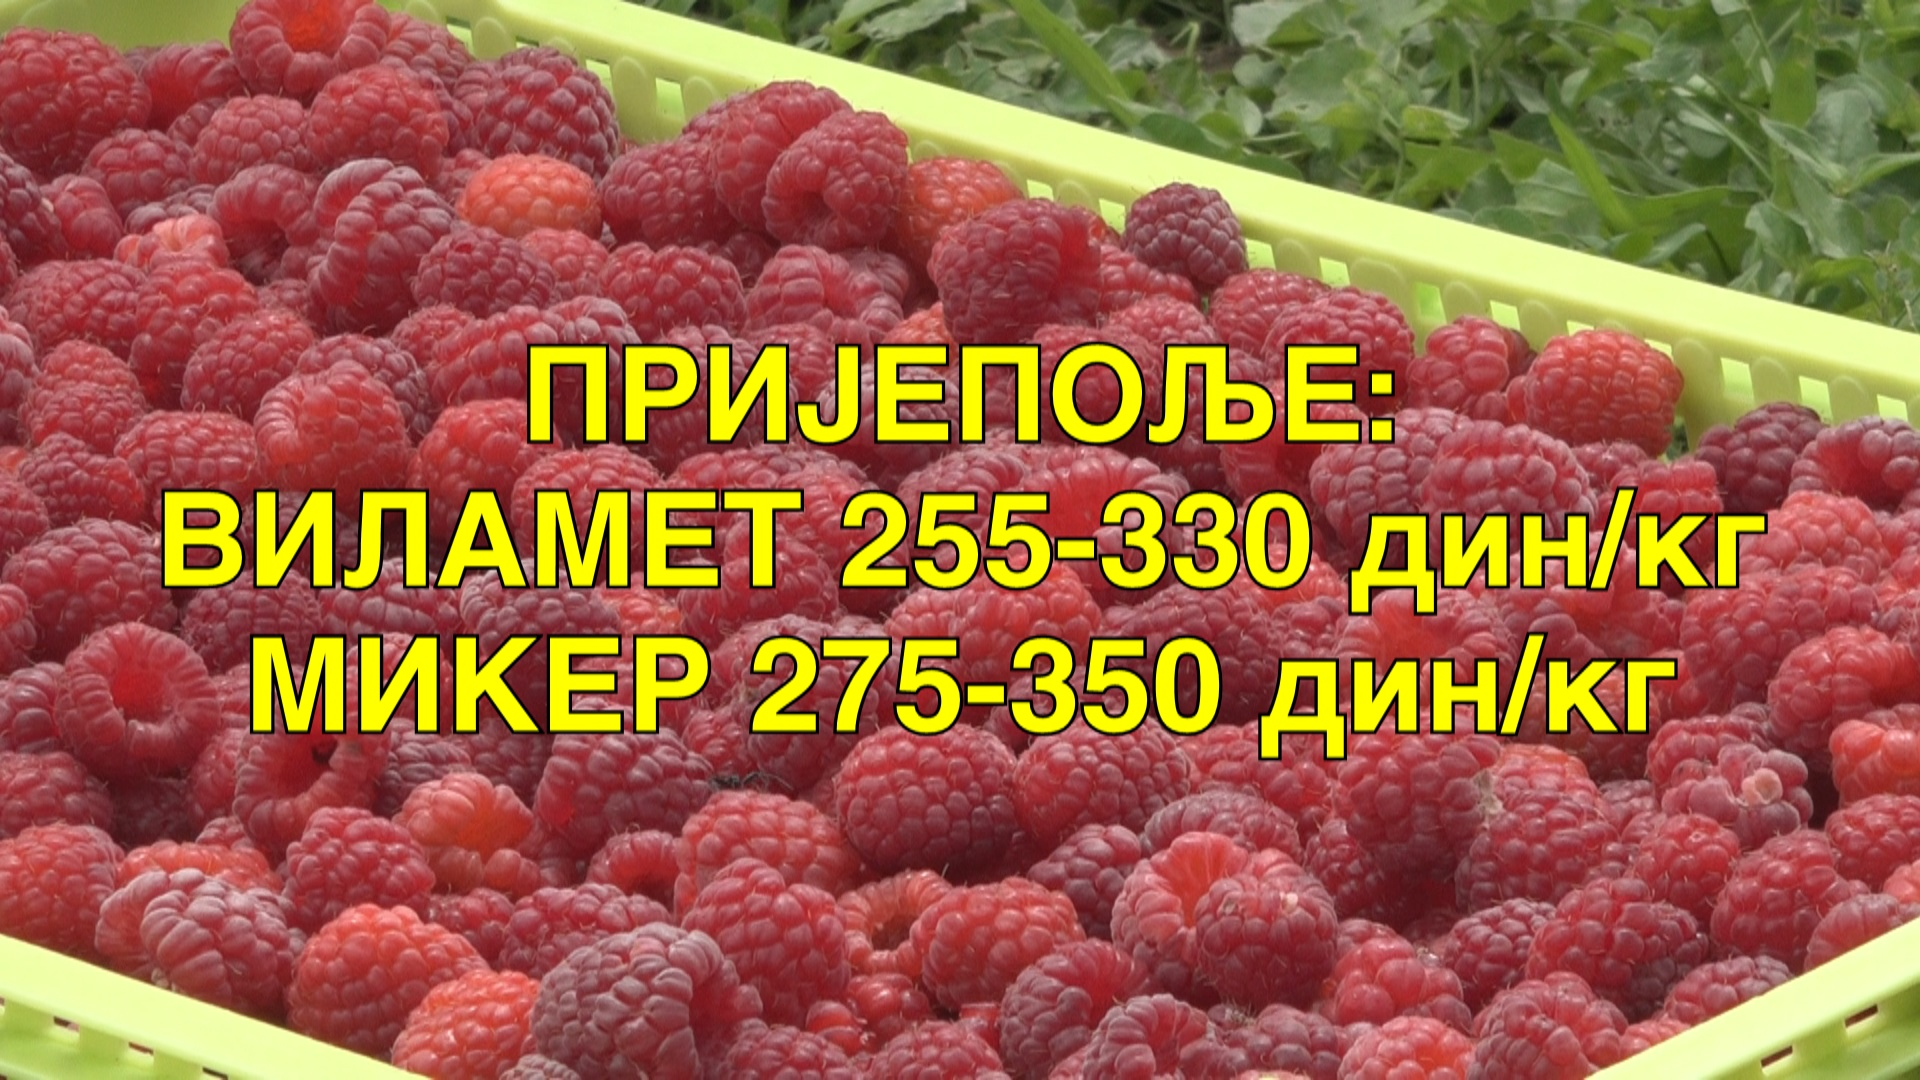 Пријепоље: Виламет 255-330 дин/кг – Микер 275-350 дин/кг